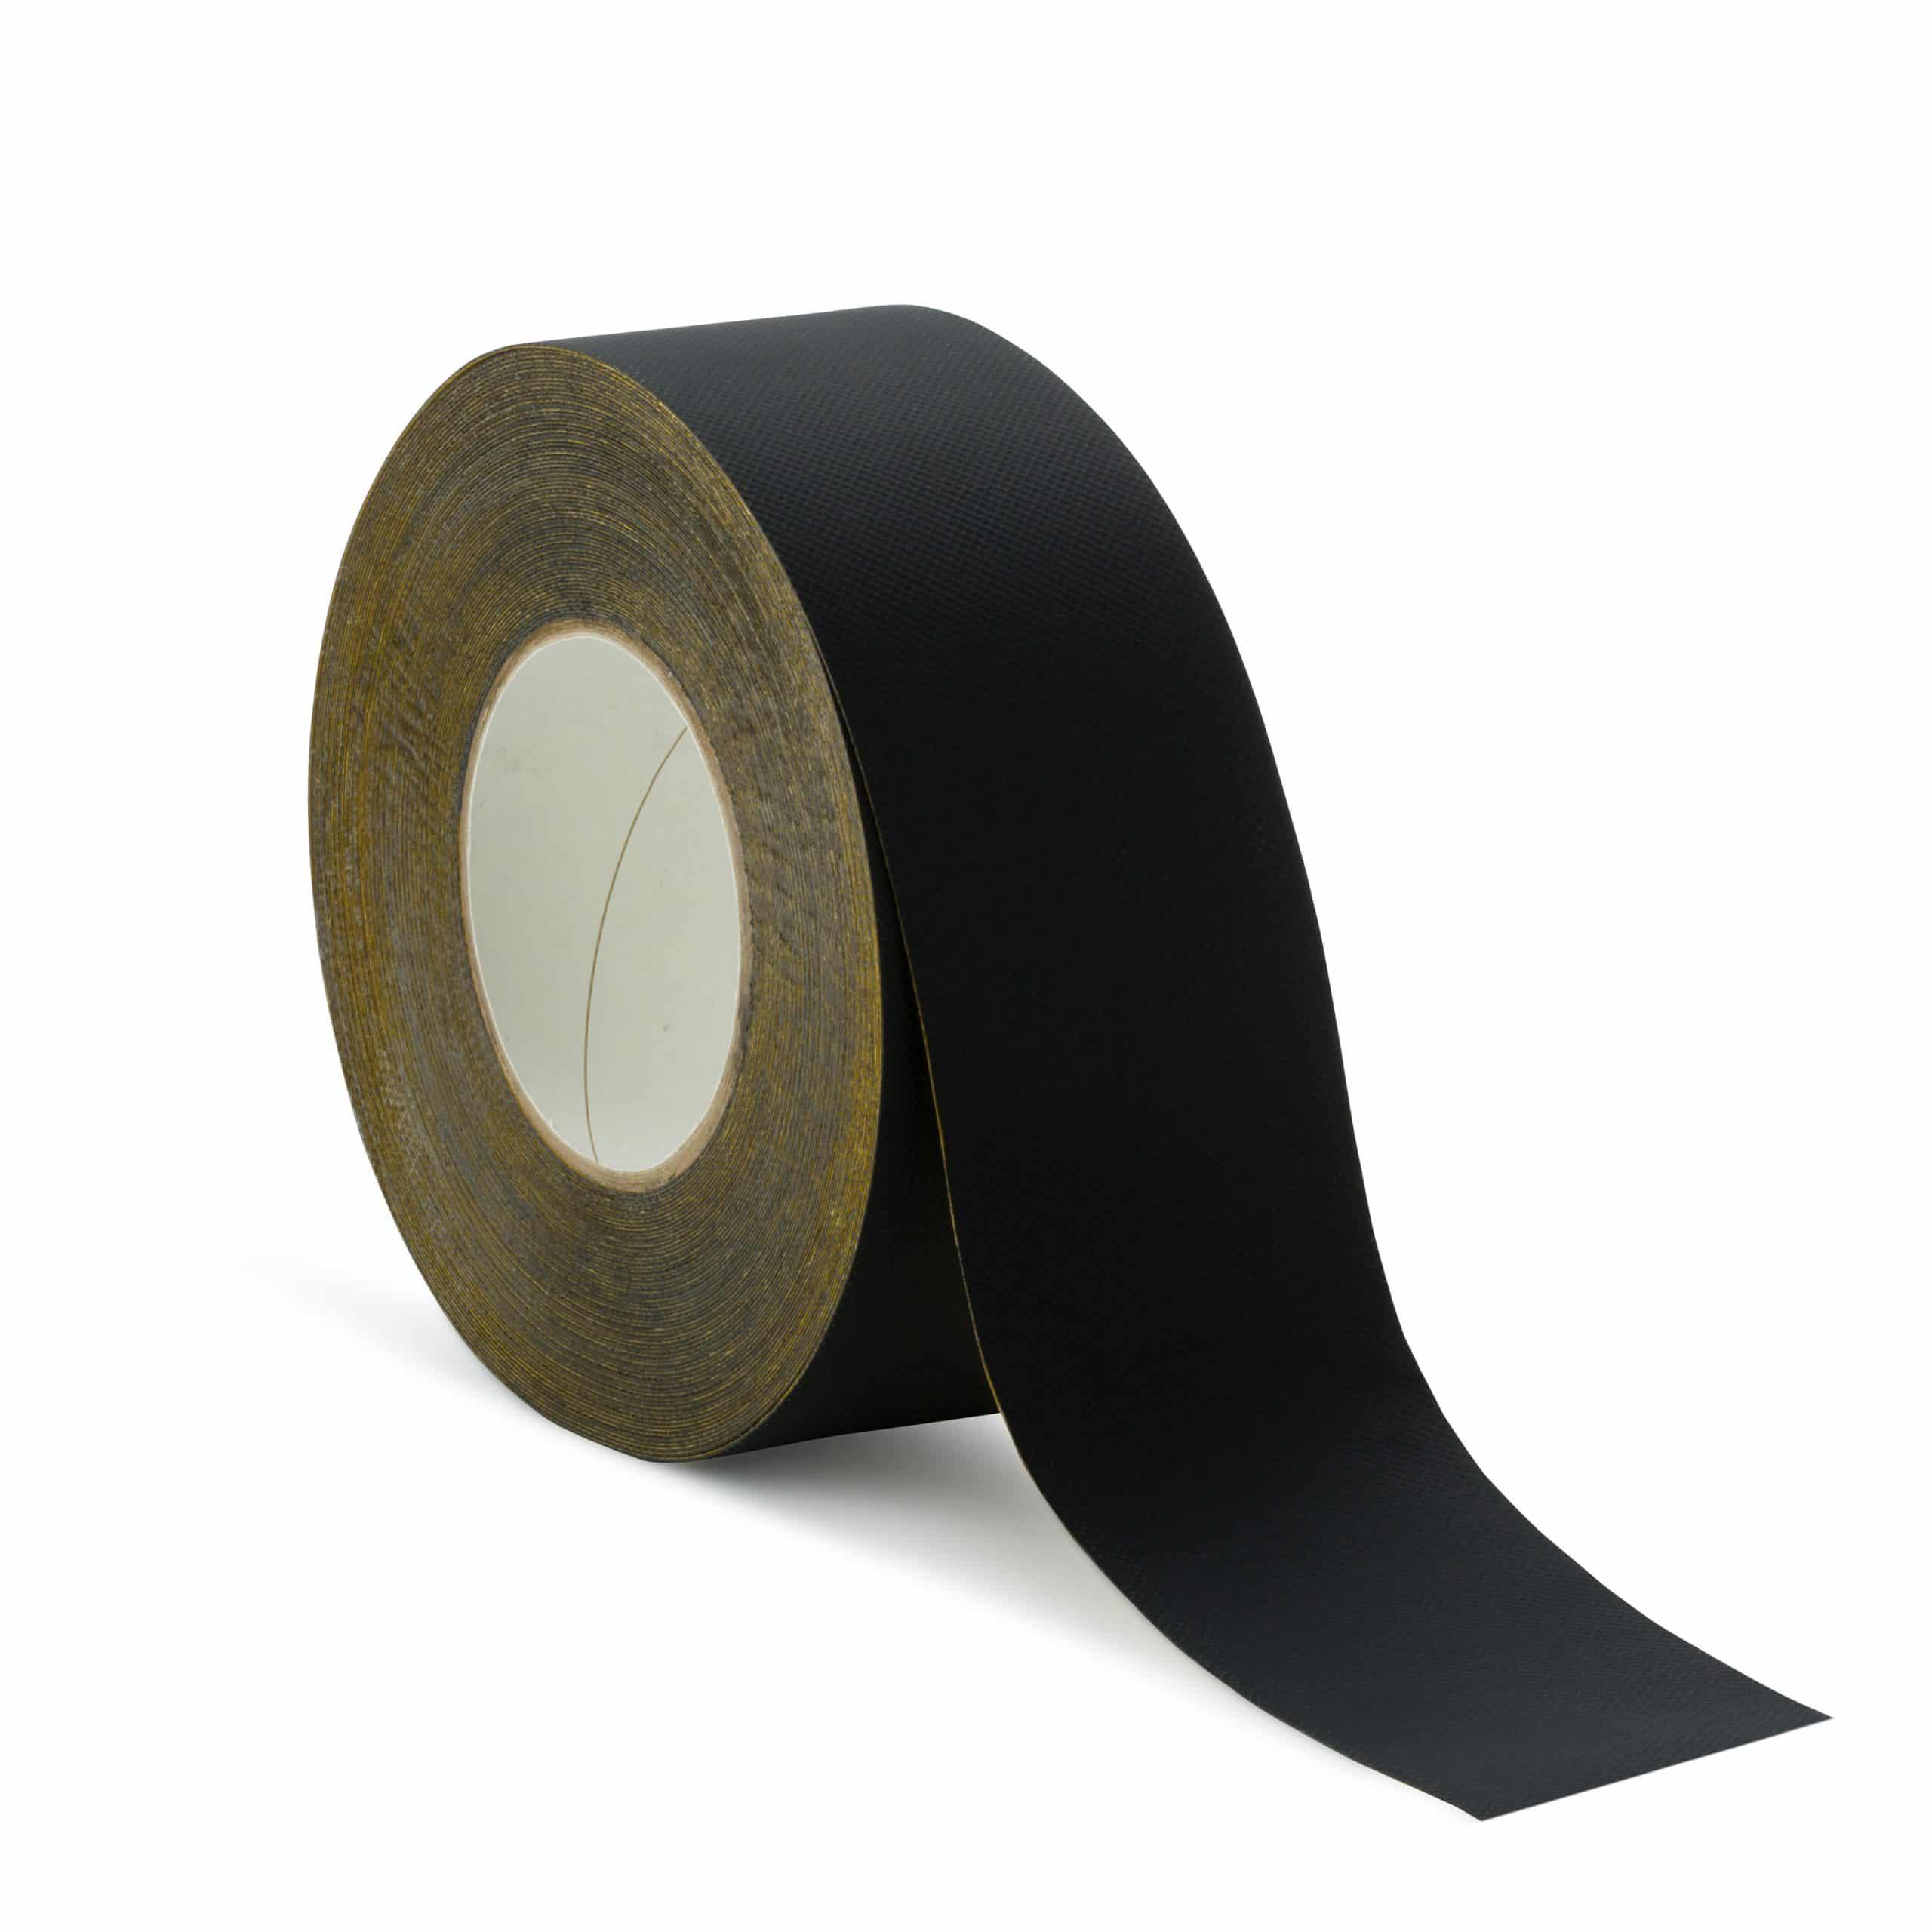 VAST-R Facade tape